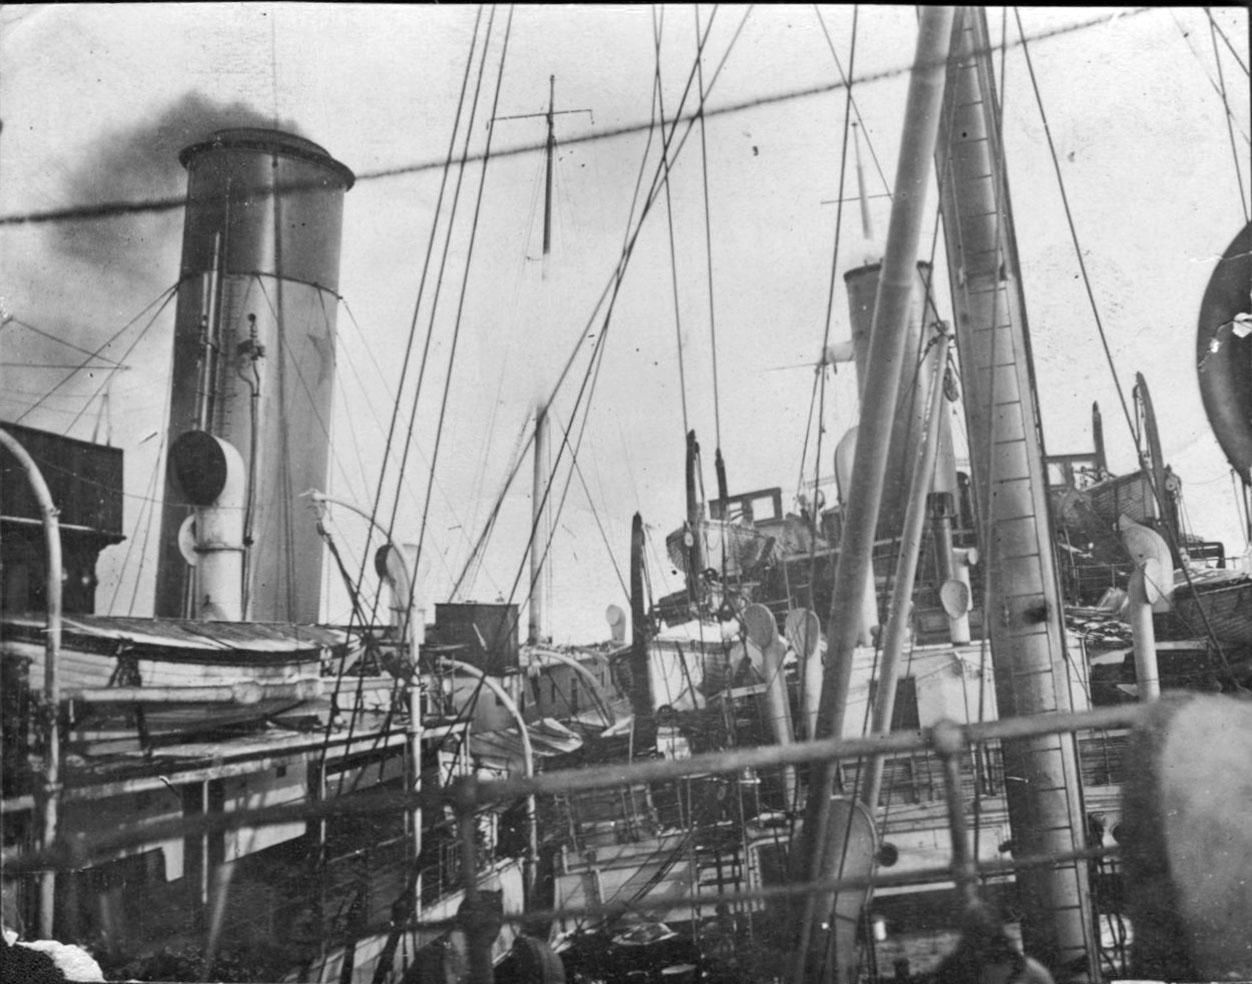 К пароходу «Сахалин» пришвартован ледорез «Федор Литке». Январь 1932 года.